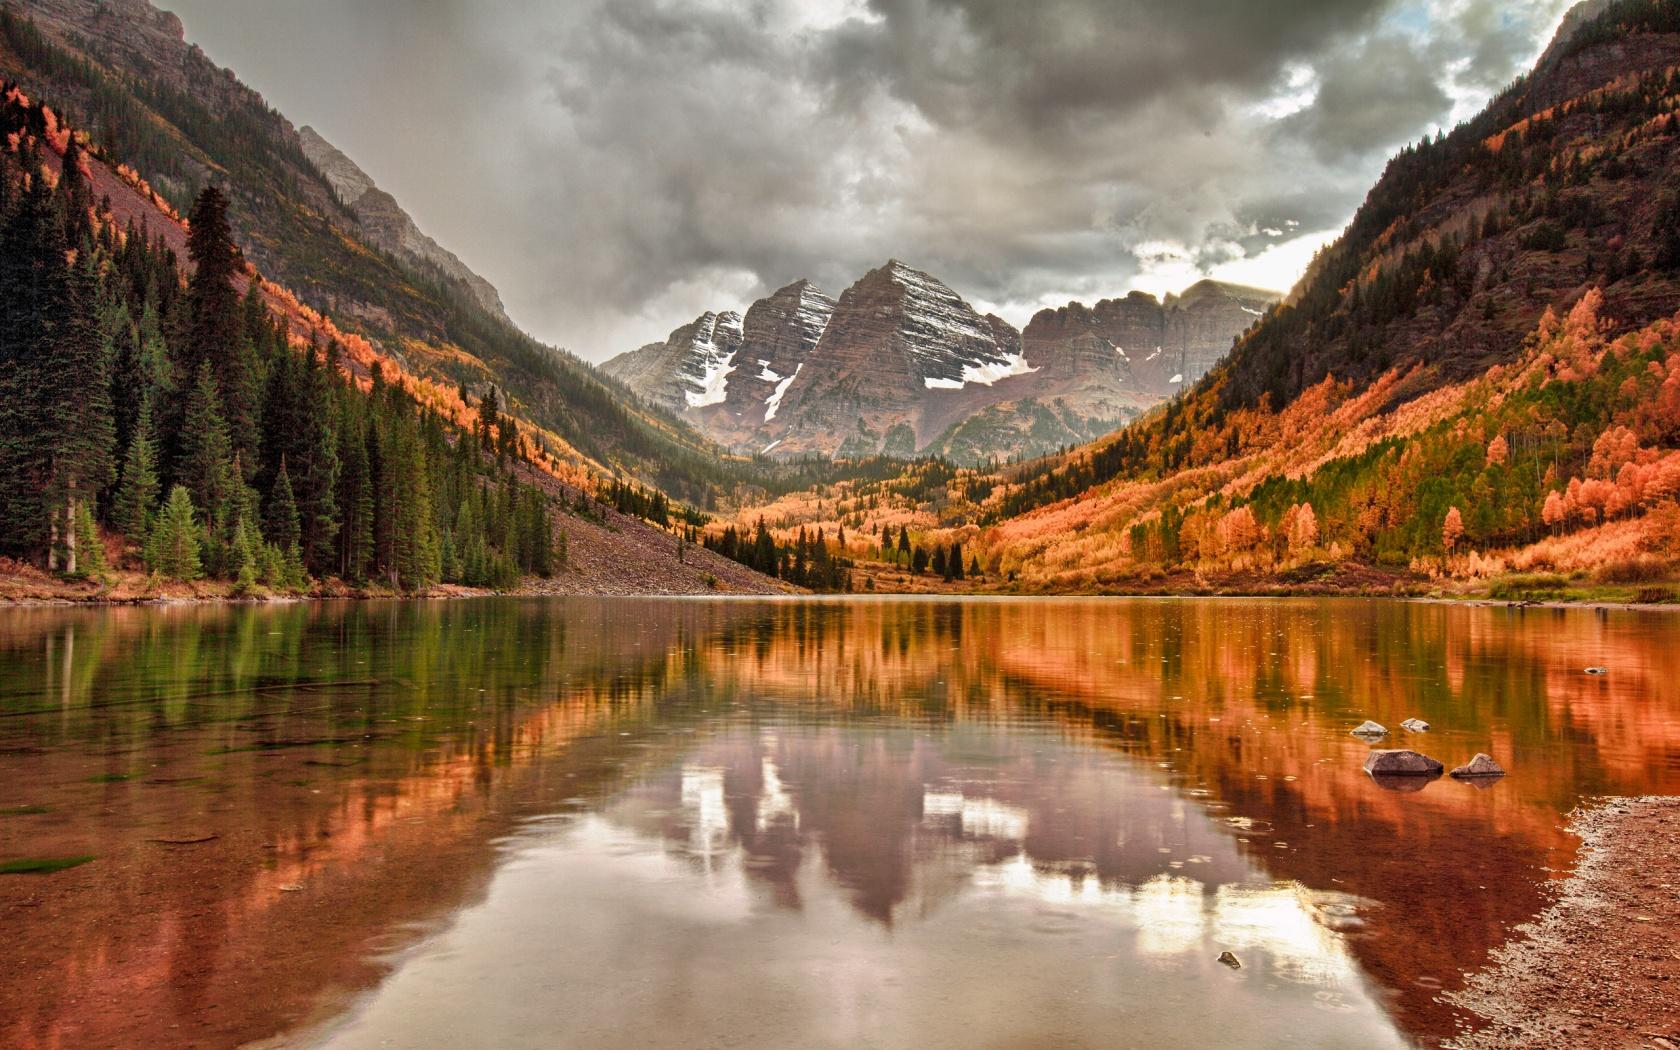 Nature mountain lake 1680 x 1050 download close